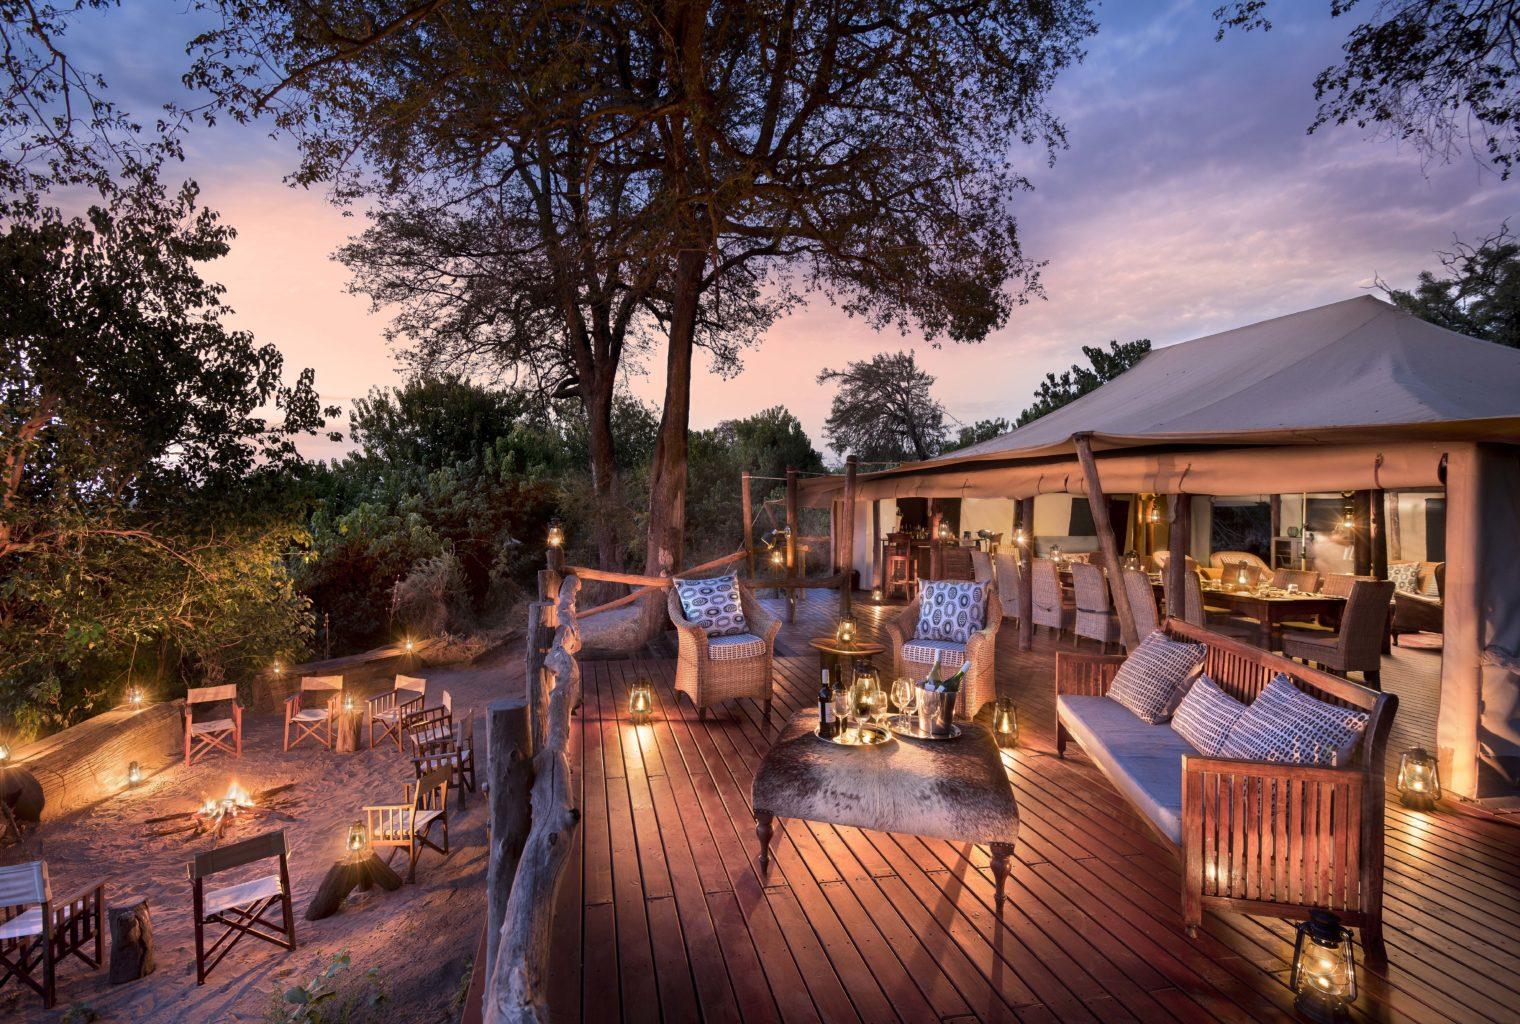 Linyanti Bush Camp Botswana Deck Area